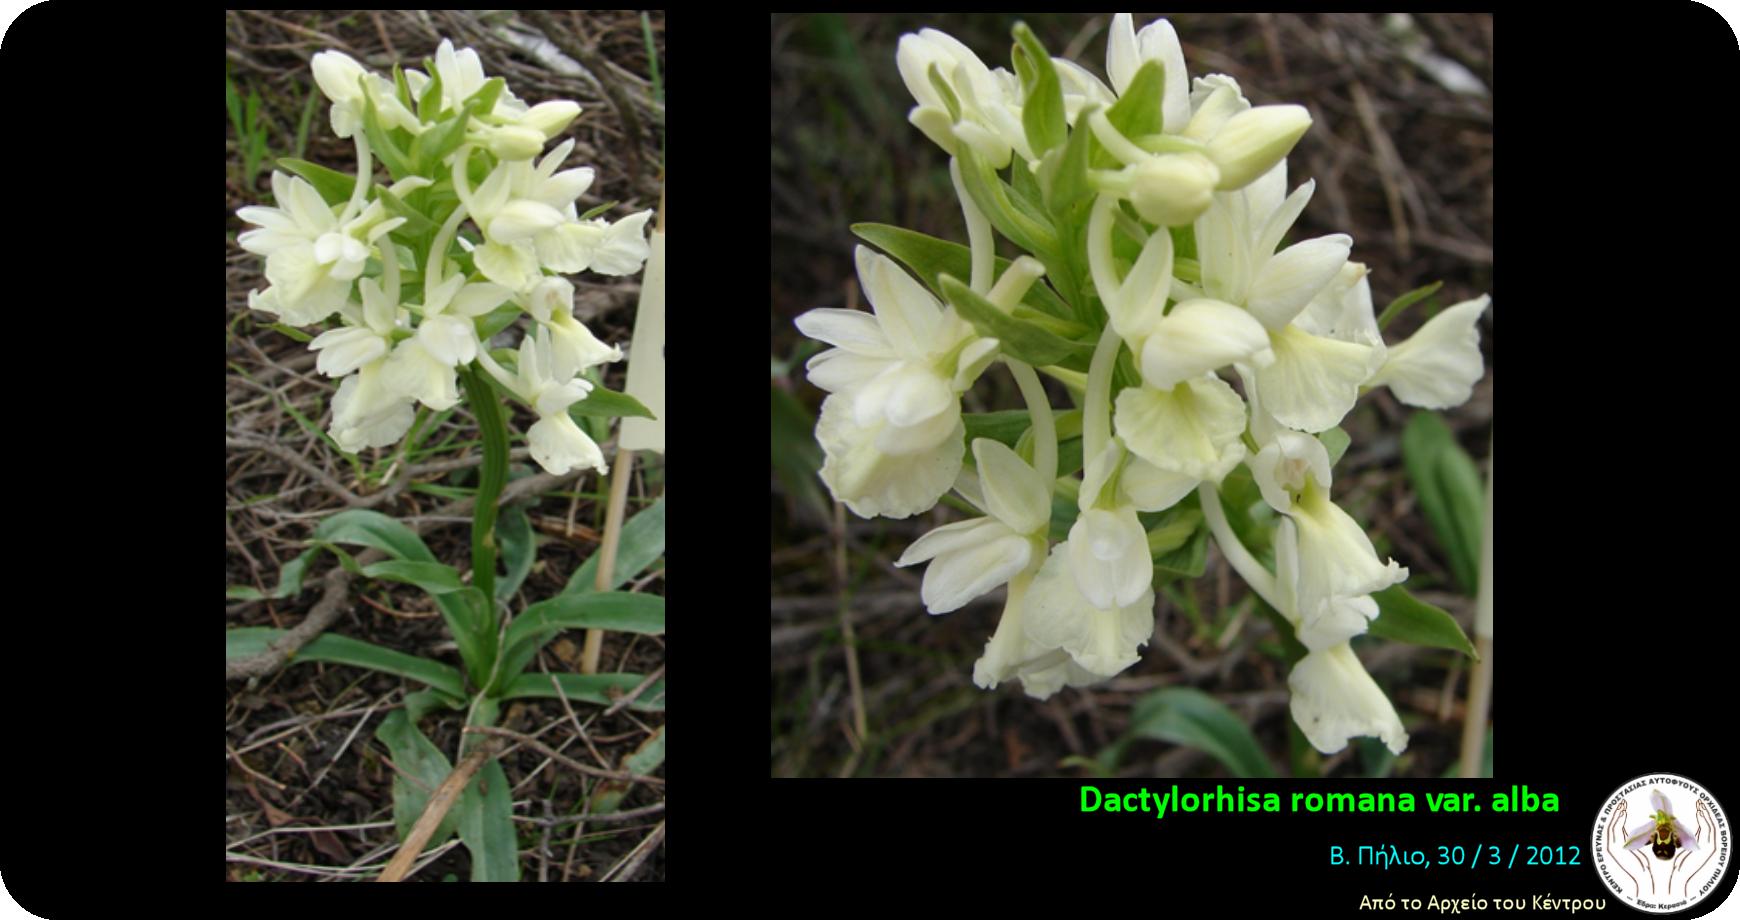 Dactylorhiza romana var alba.png